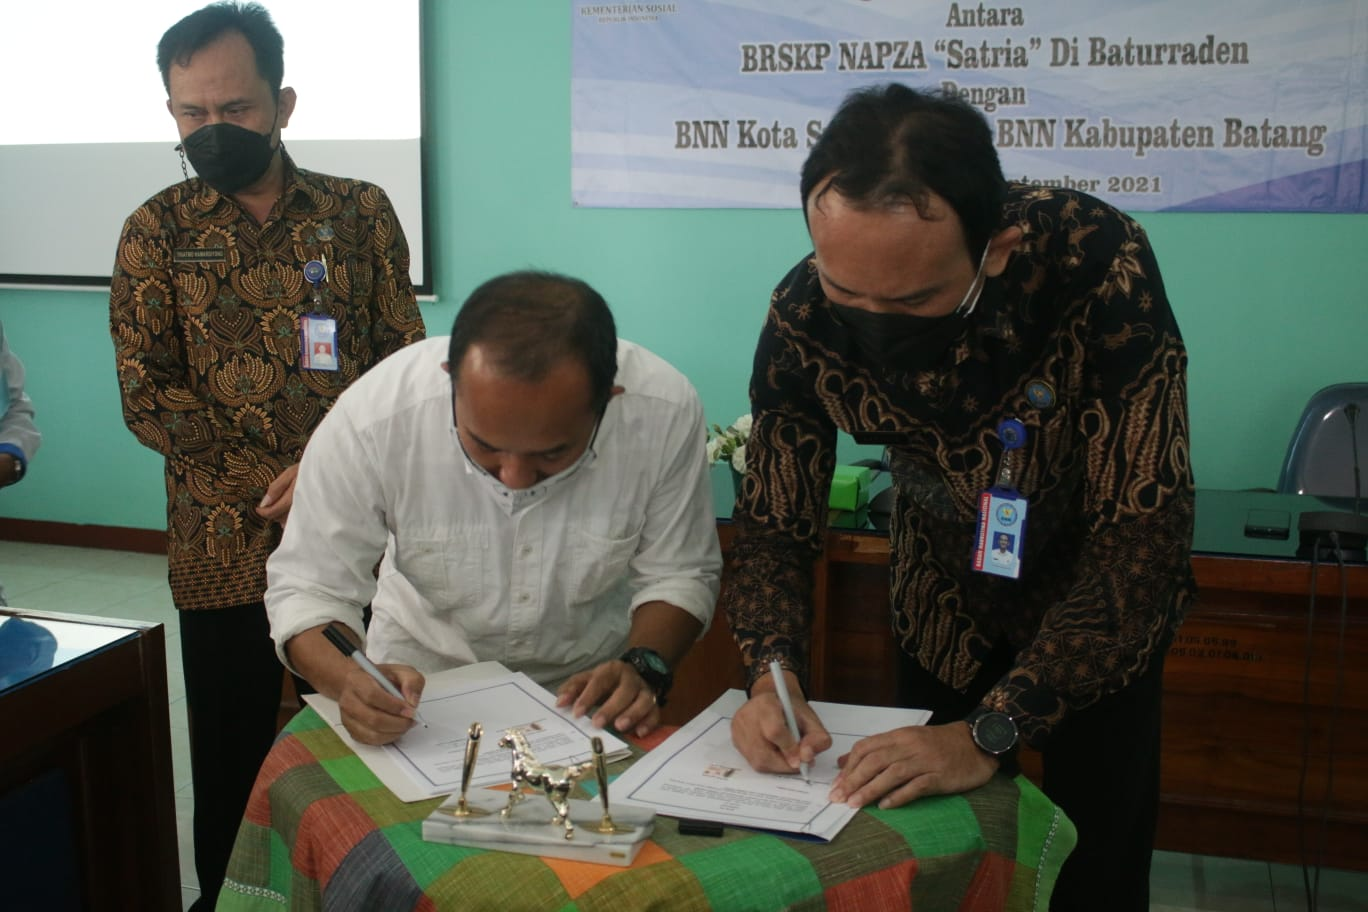 "Balai ""Satria"" Jalin Sinergi dengan BNNK Surakarta dan Batang Beri Layanan Rehabilitasi Berkelanjutan bagi KPN"